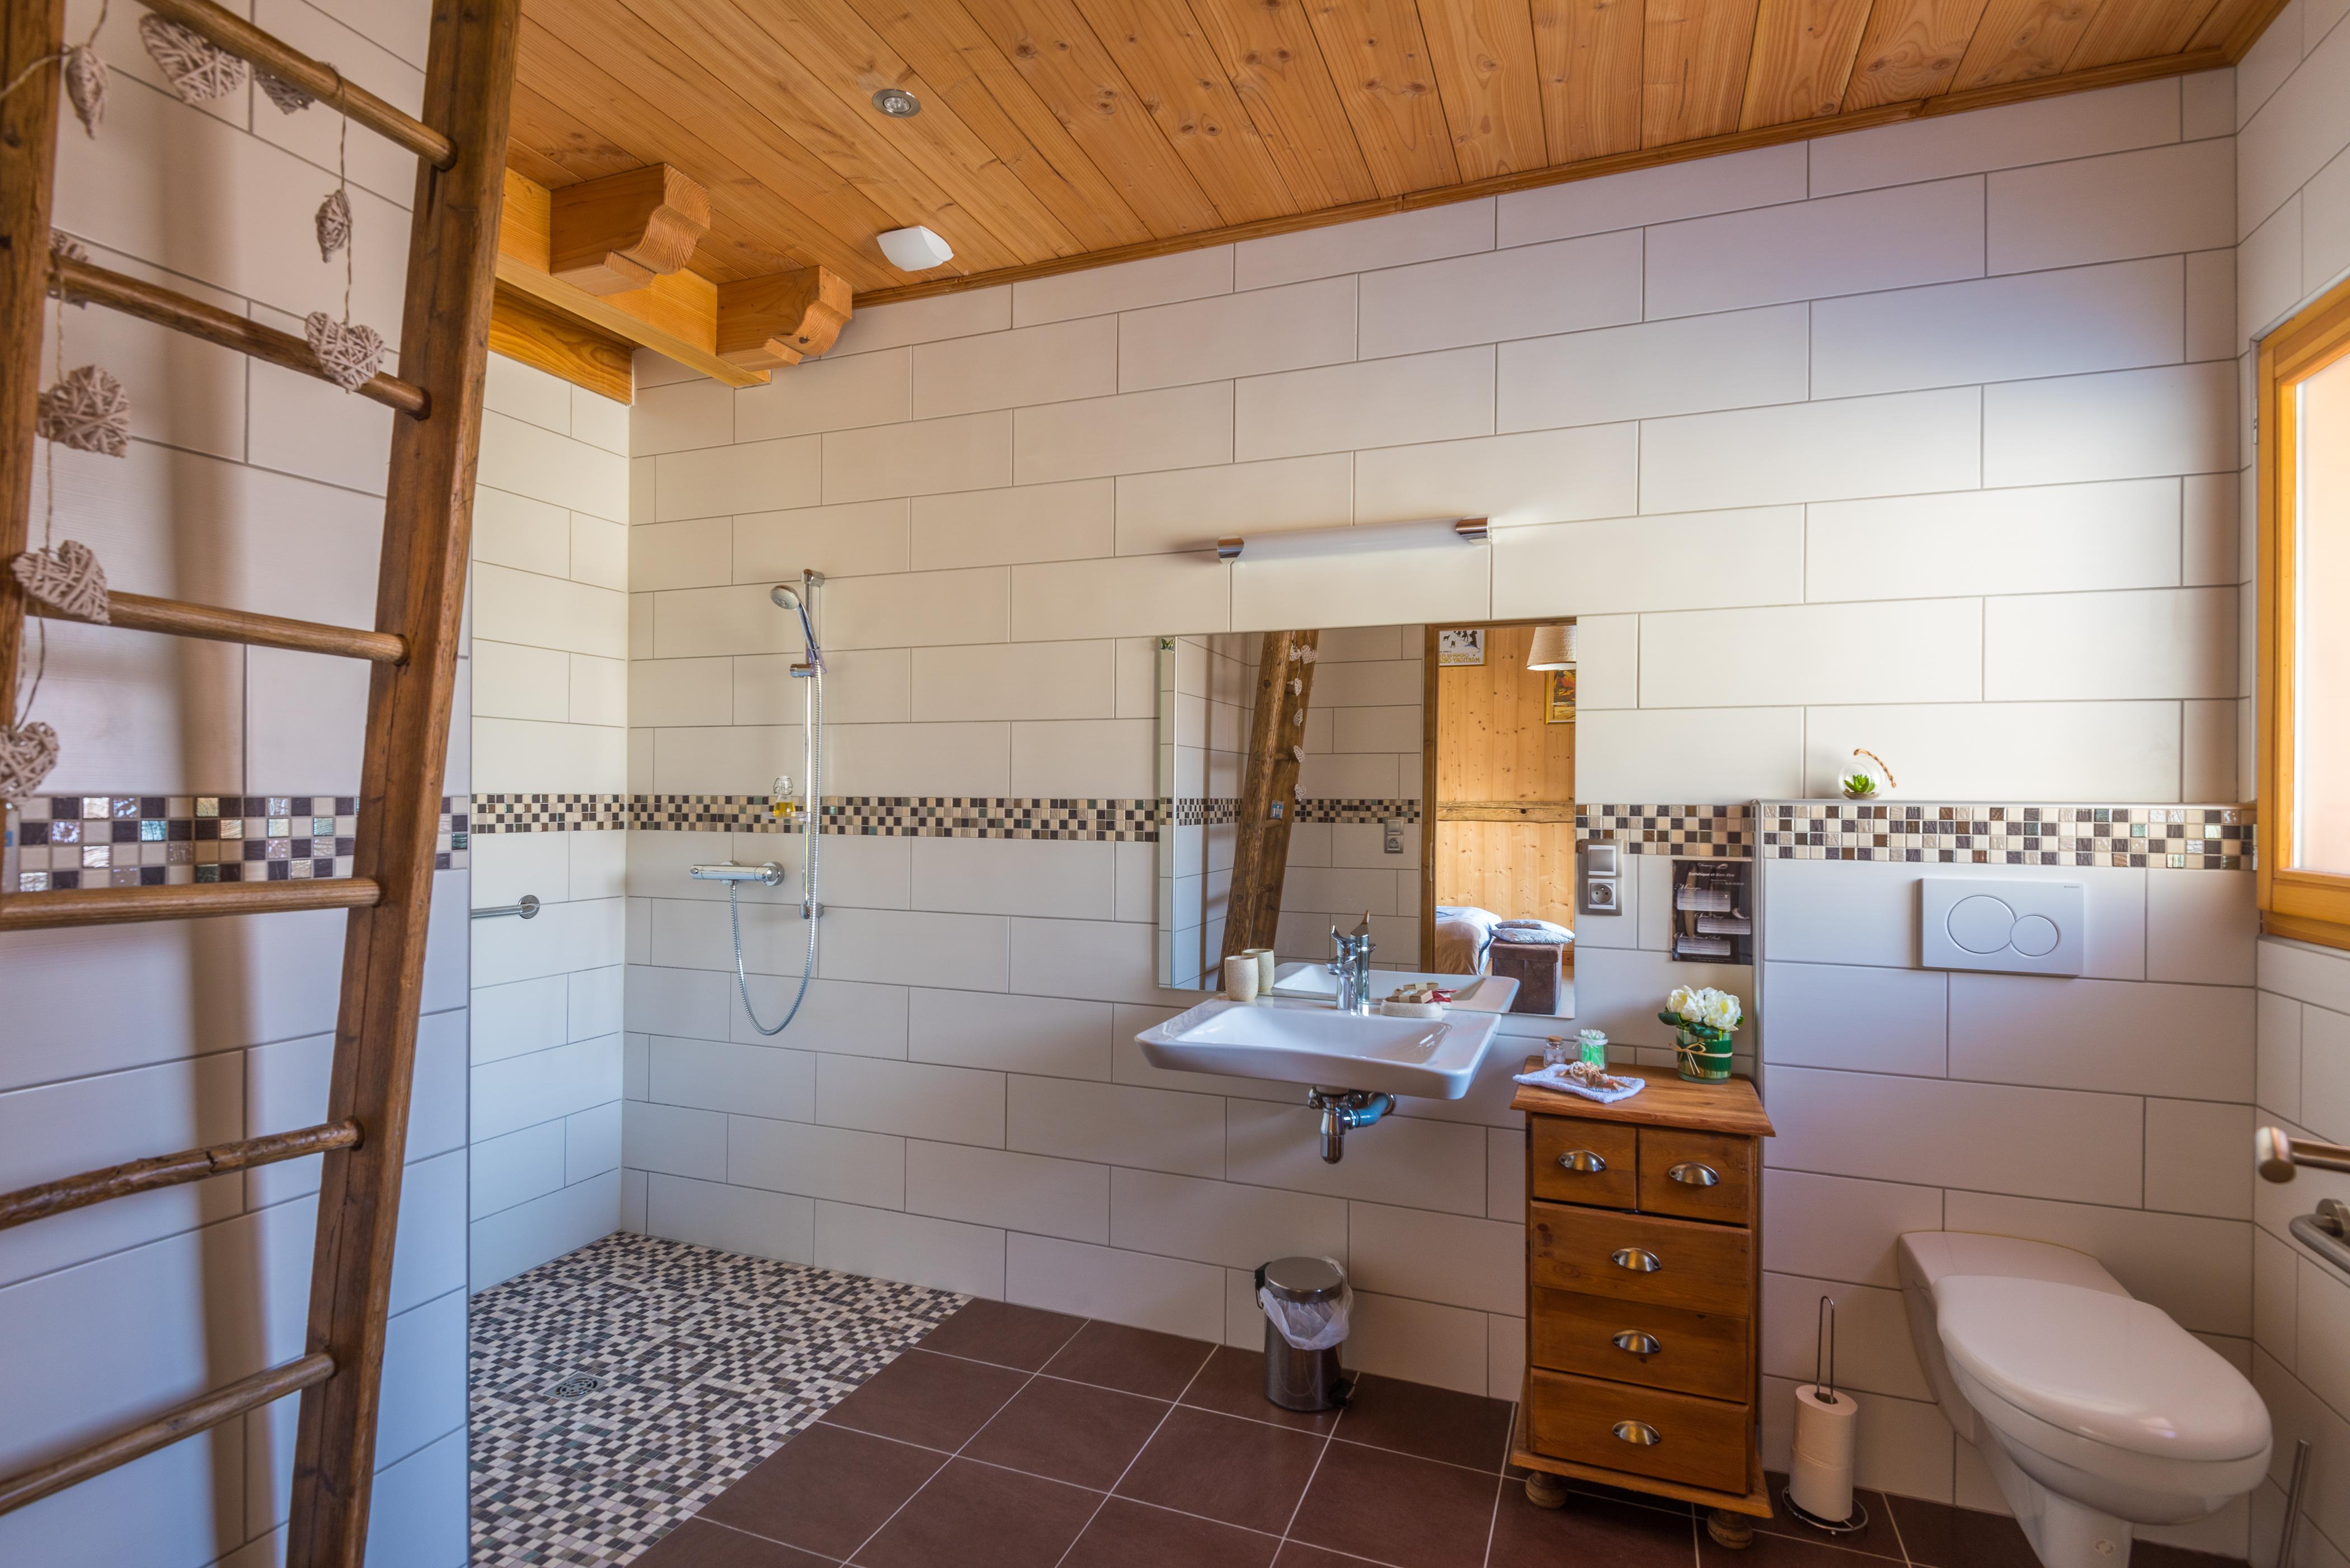 la salle de bain Pointe Percée